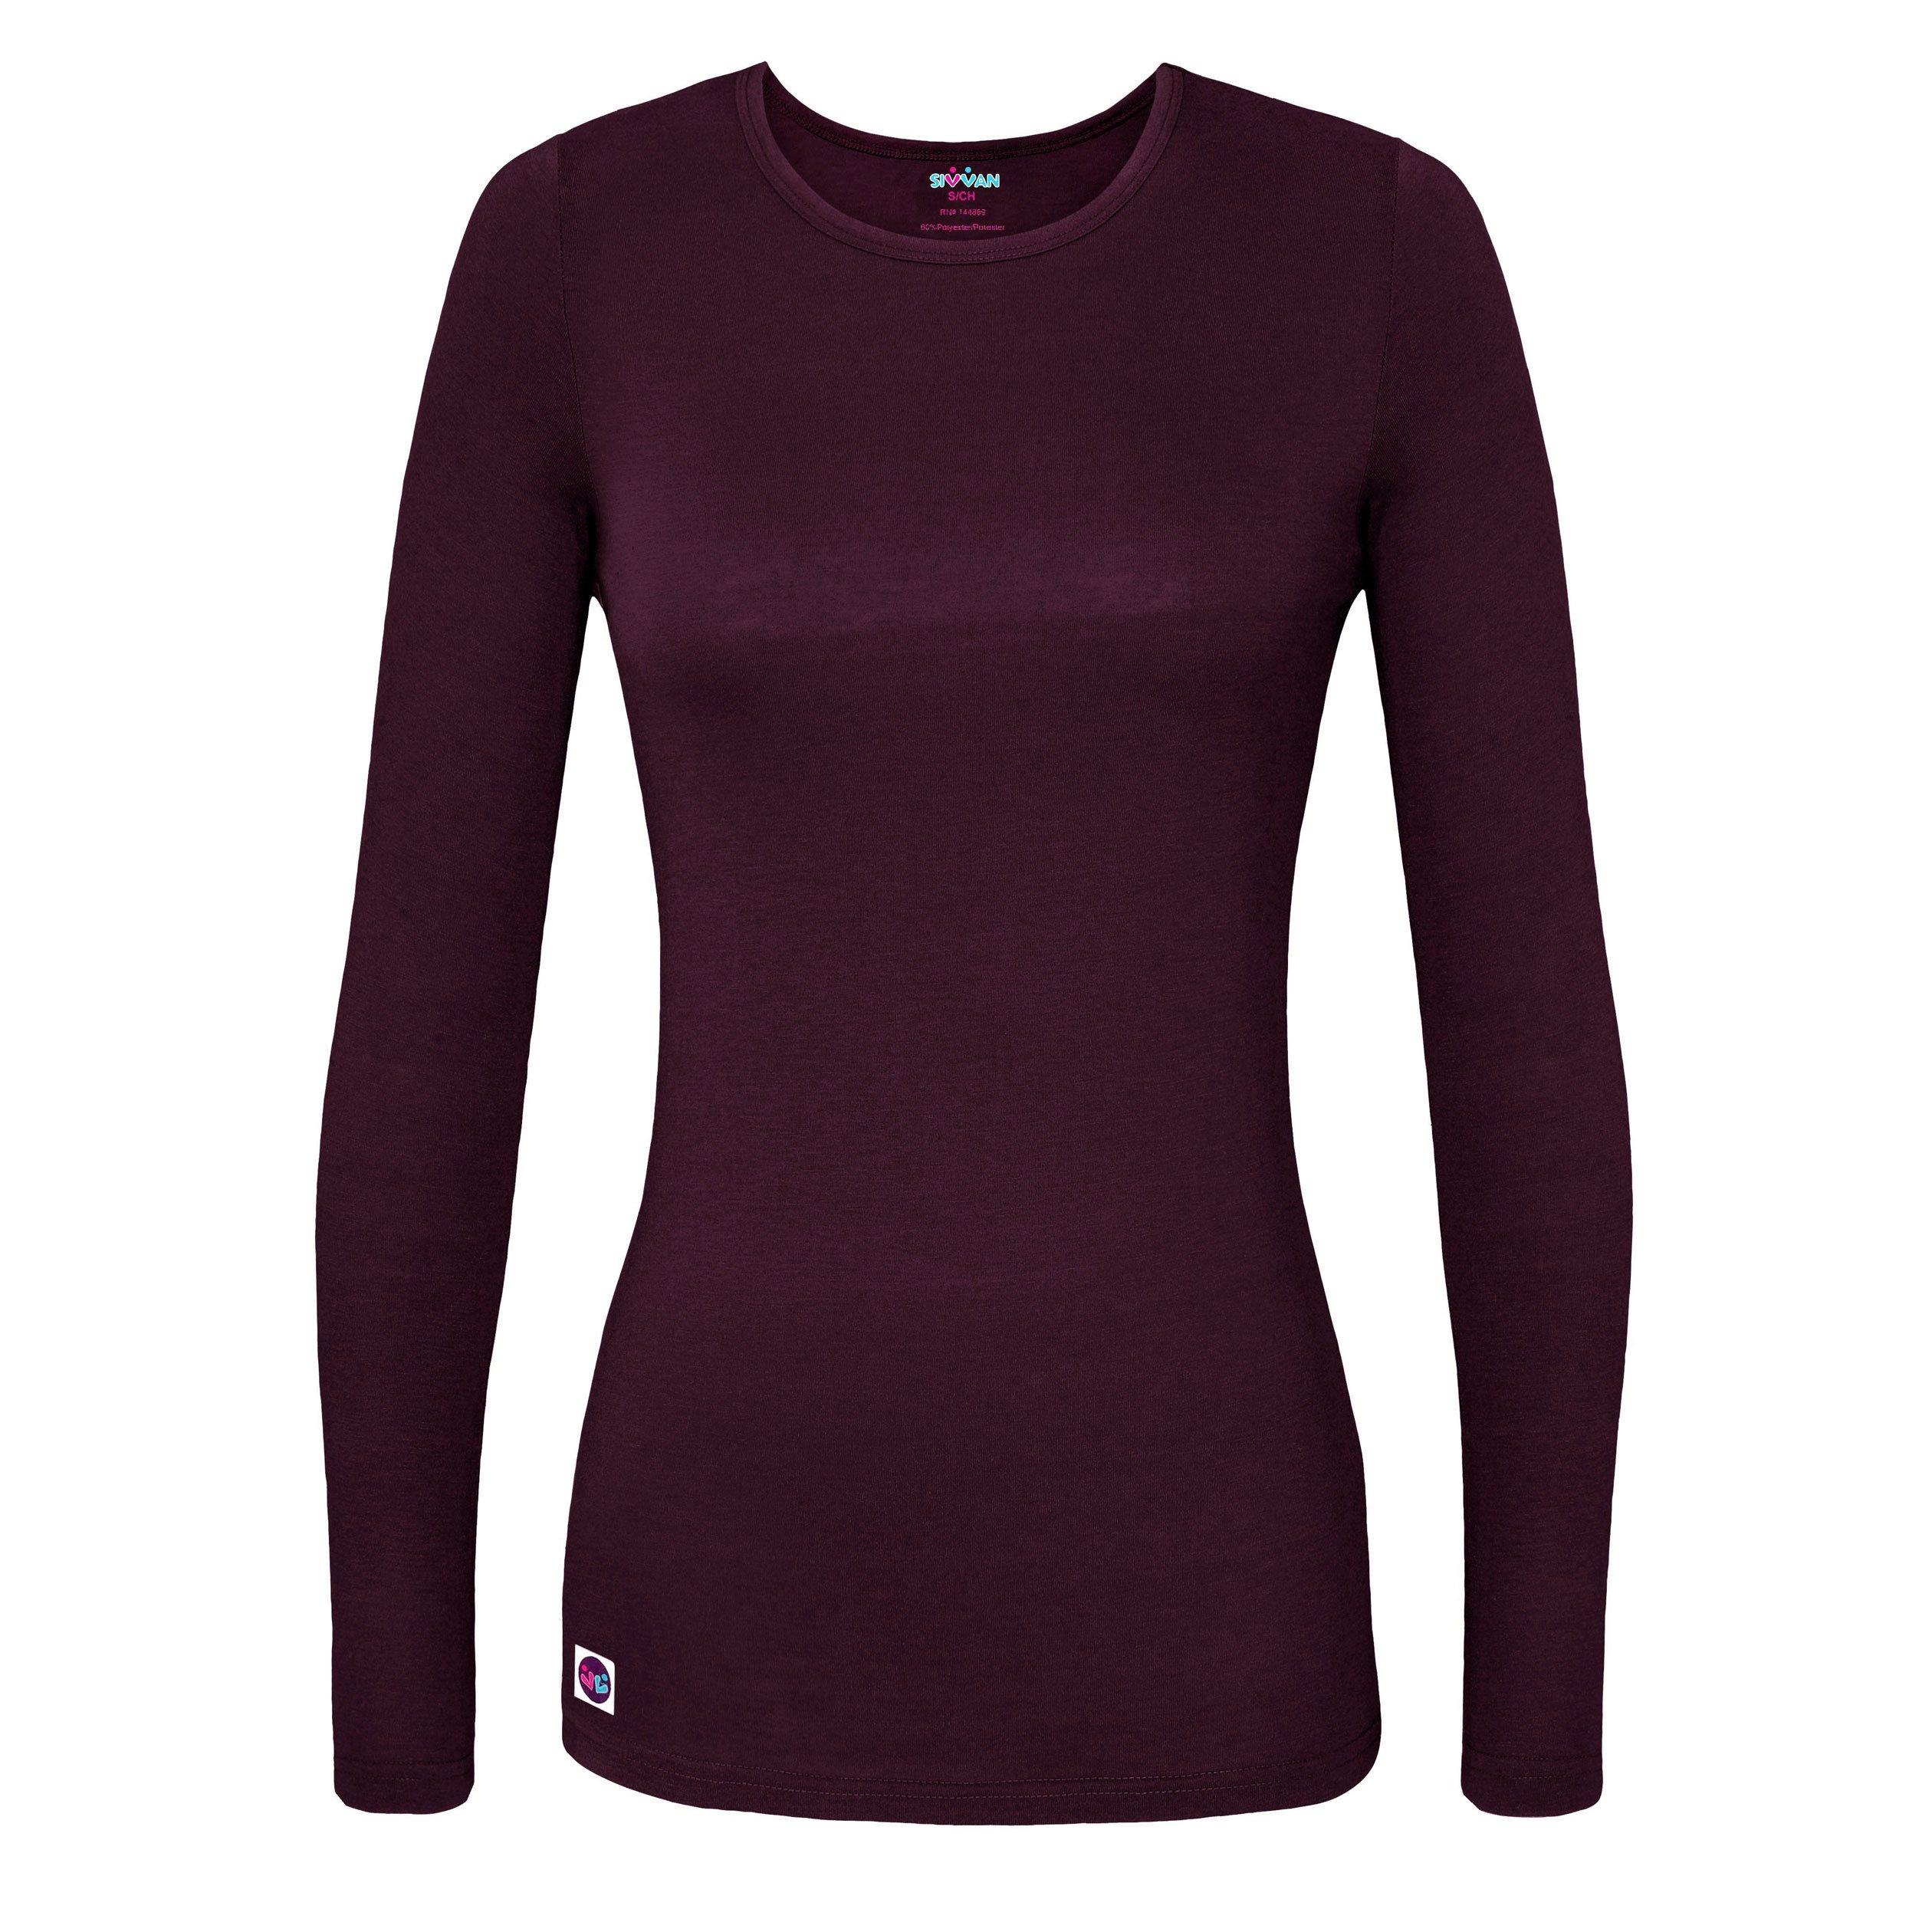 Sivvan women s comfort long sleeve t shirt underscrub tee for Womens long sleeved t shirts